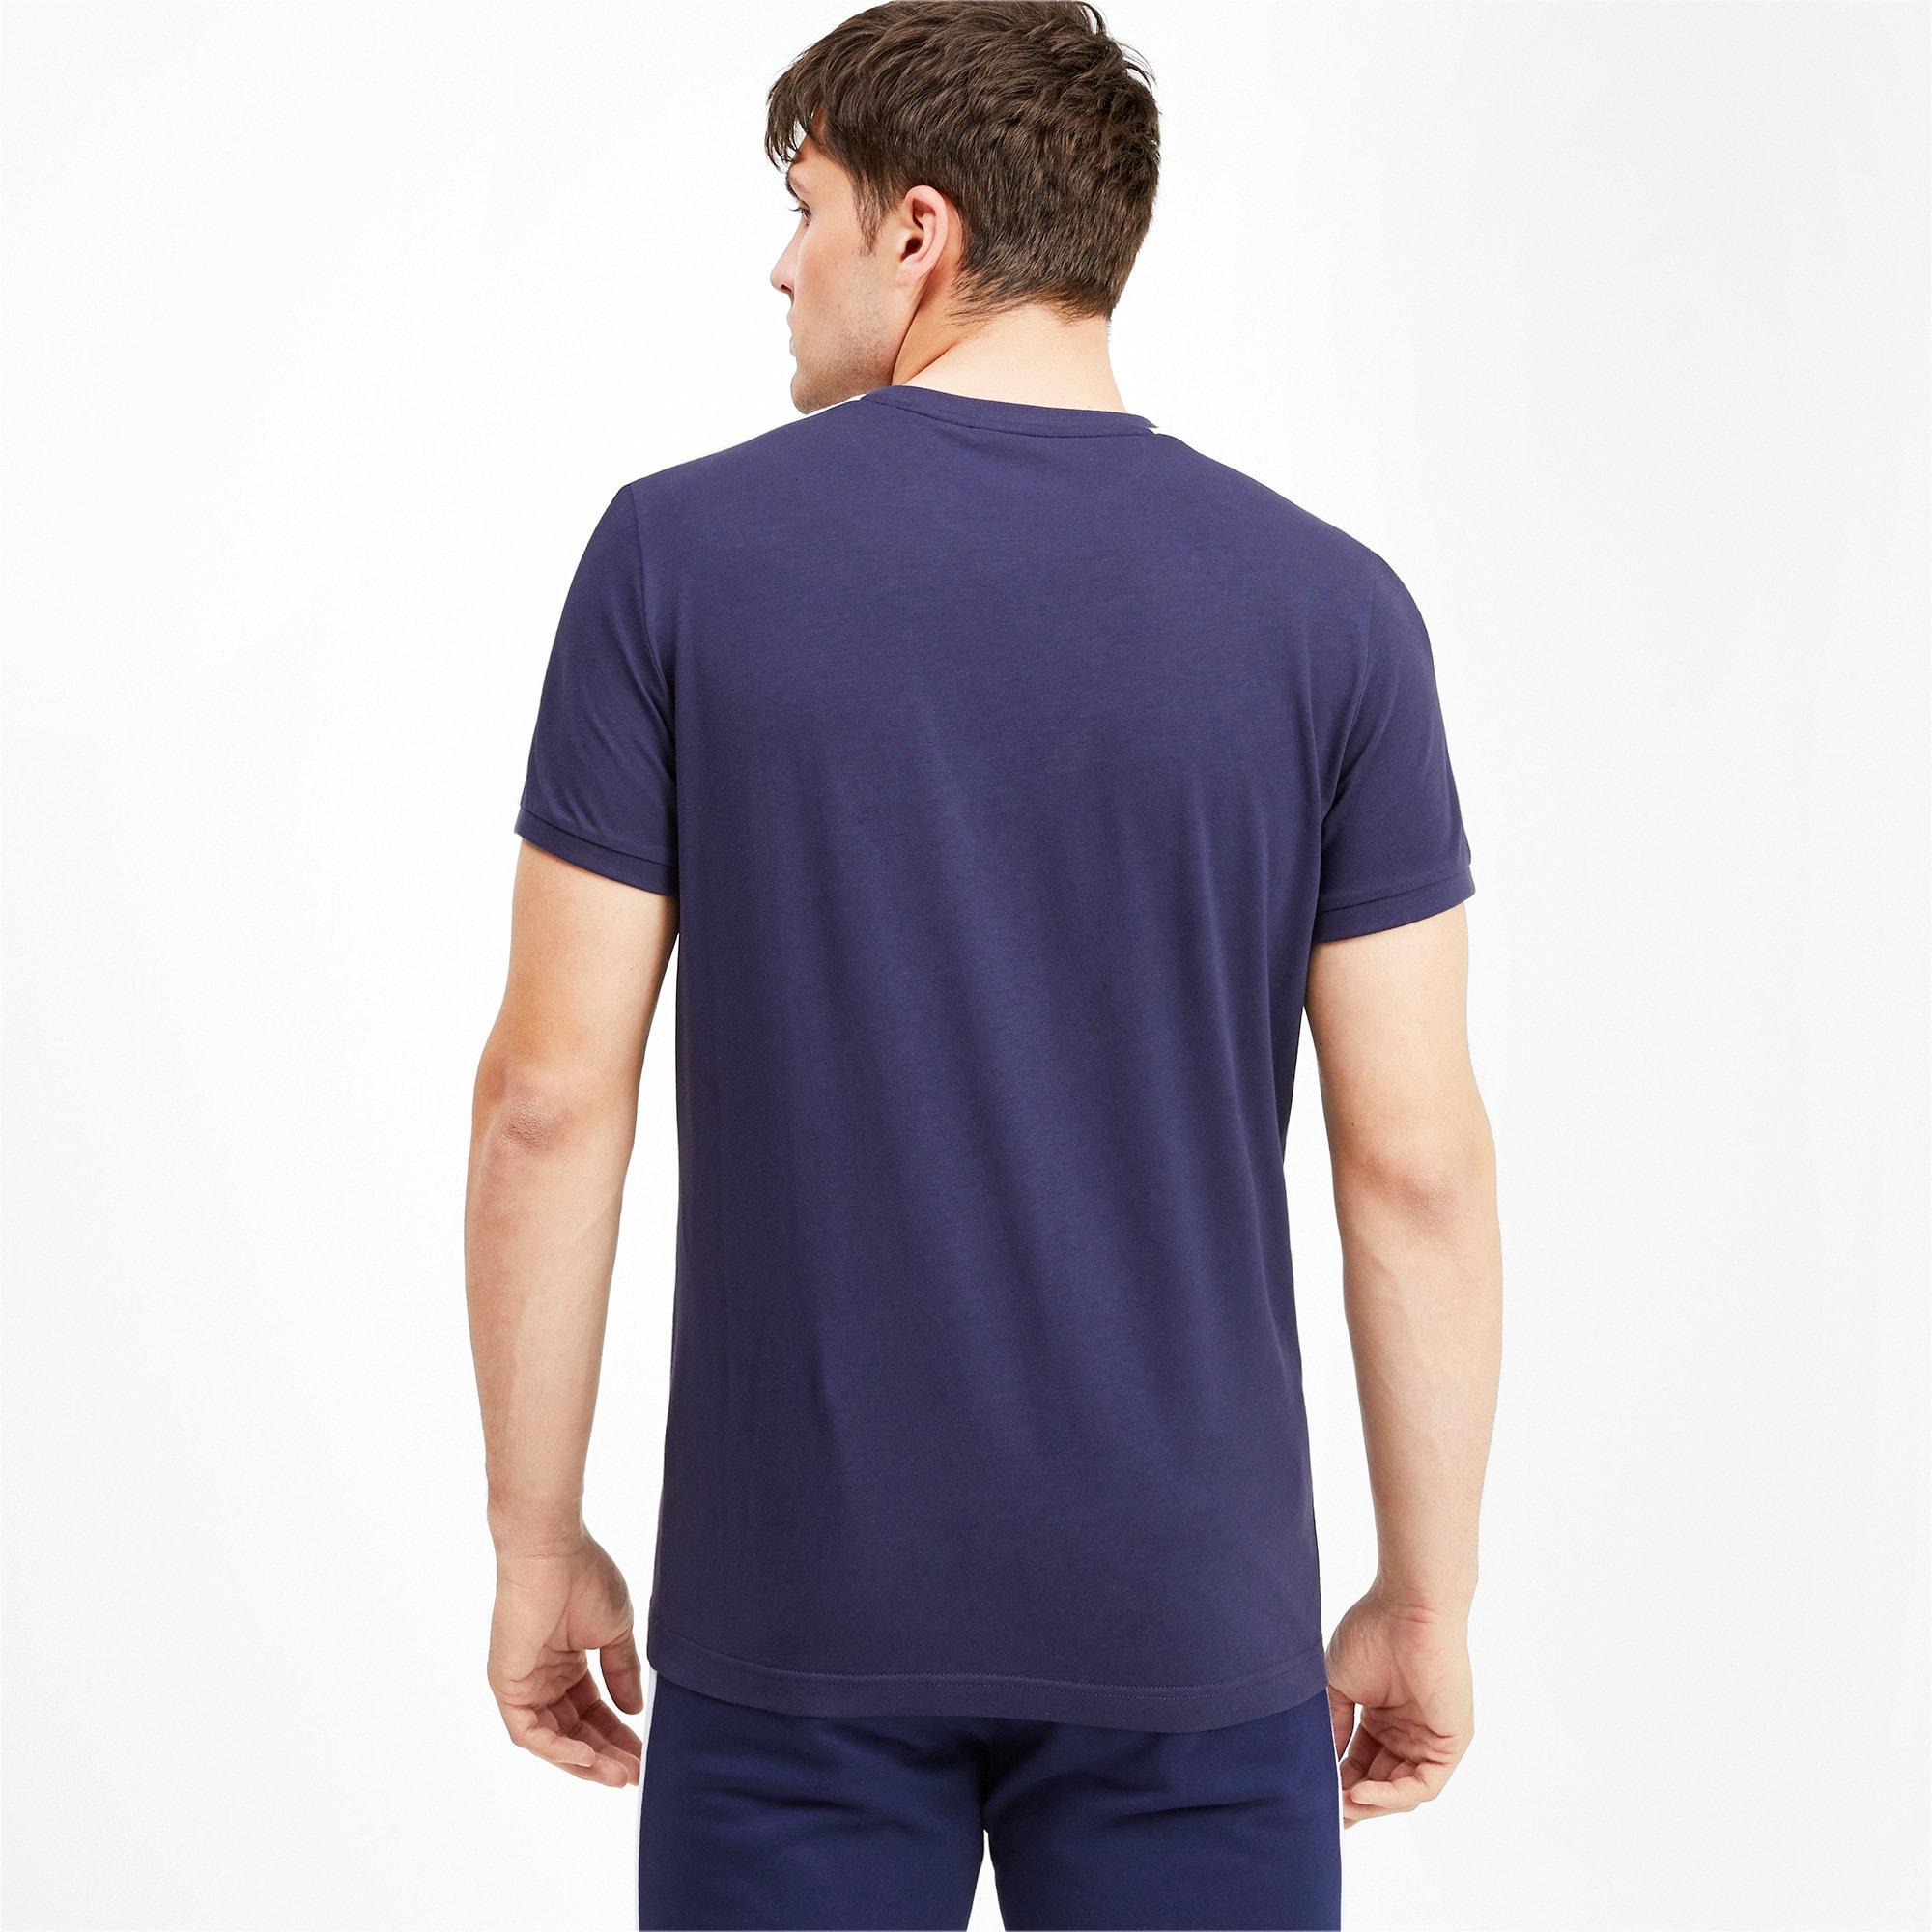 Thumbnail 2 van Iconisch T7 T-shirt voor mannen, Nachtblauw, medium